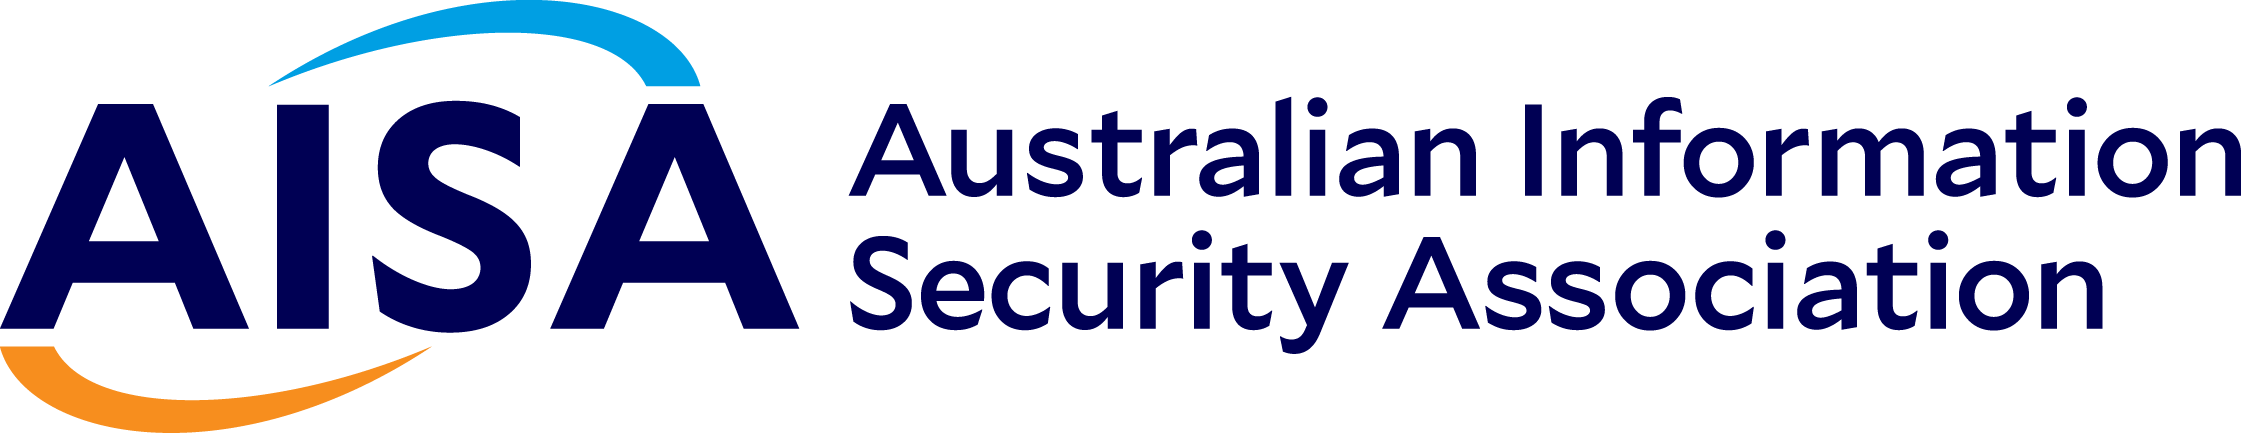 Logo da Australian Information Security Association (AISA)